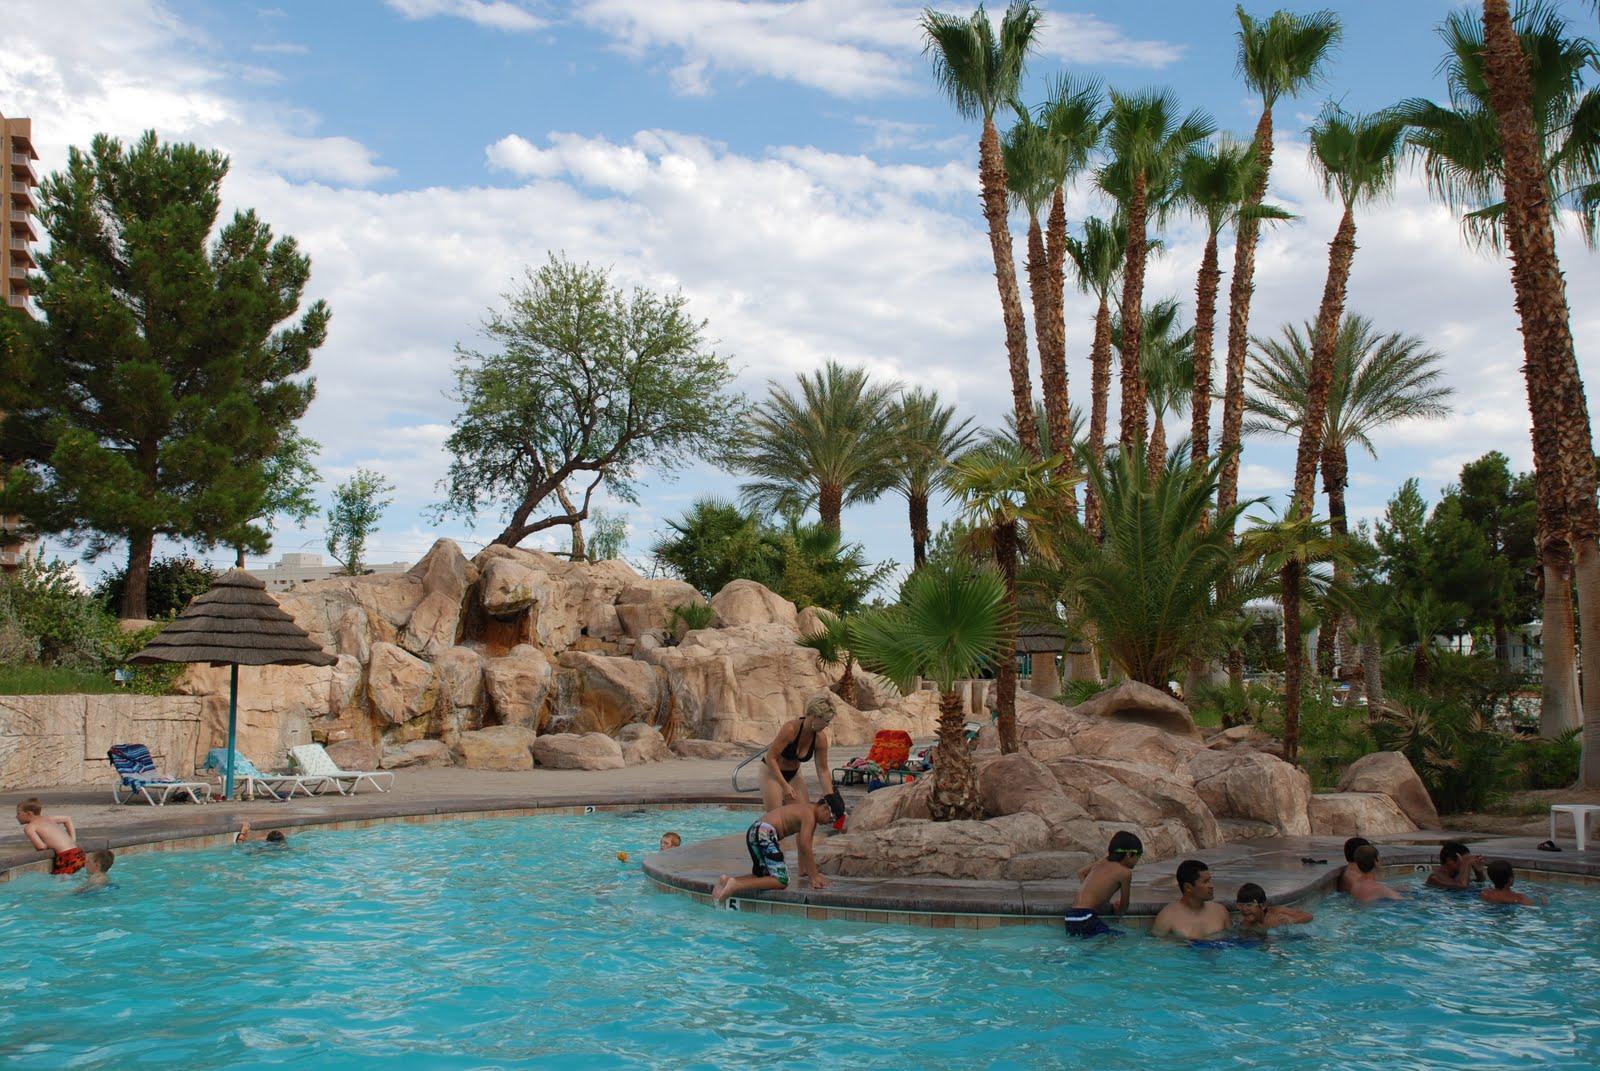 Our North American Adventure Oasis Las Vegas Rv Resort